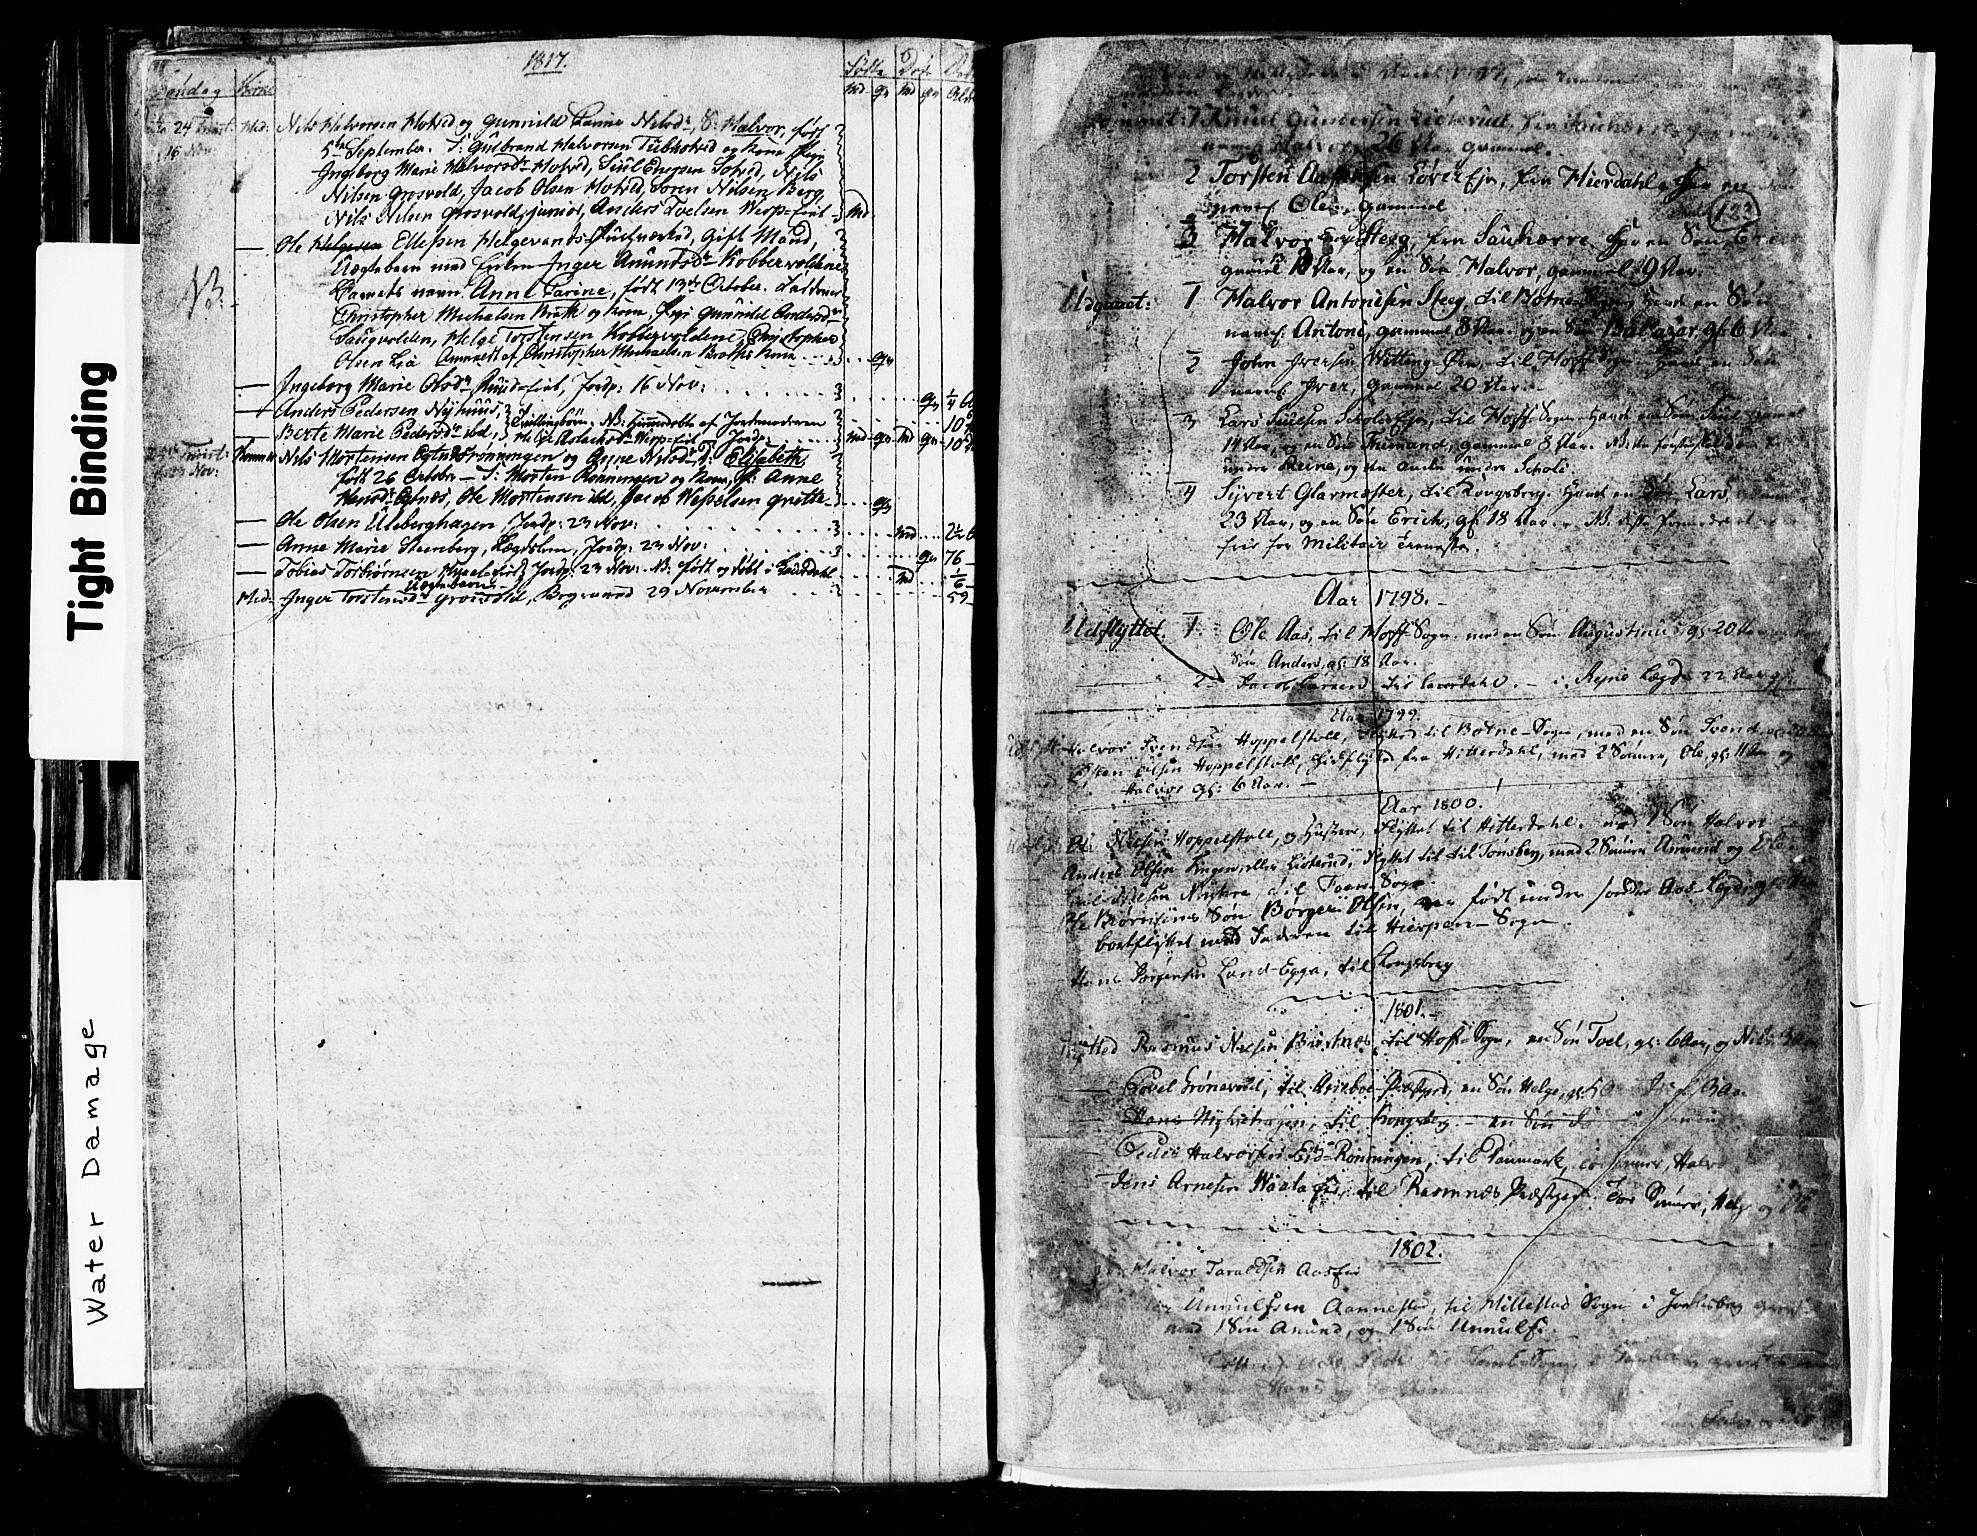 SAKO, Sandsvær kirkebøker, G/Ga/L0002: Klokkerbok nr. I 2, 1796-1817, s. 123